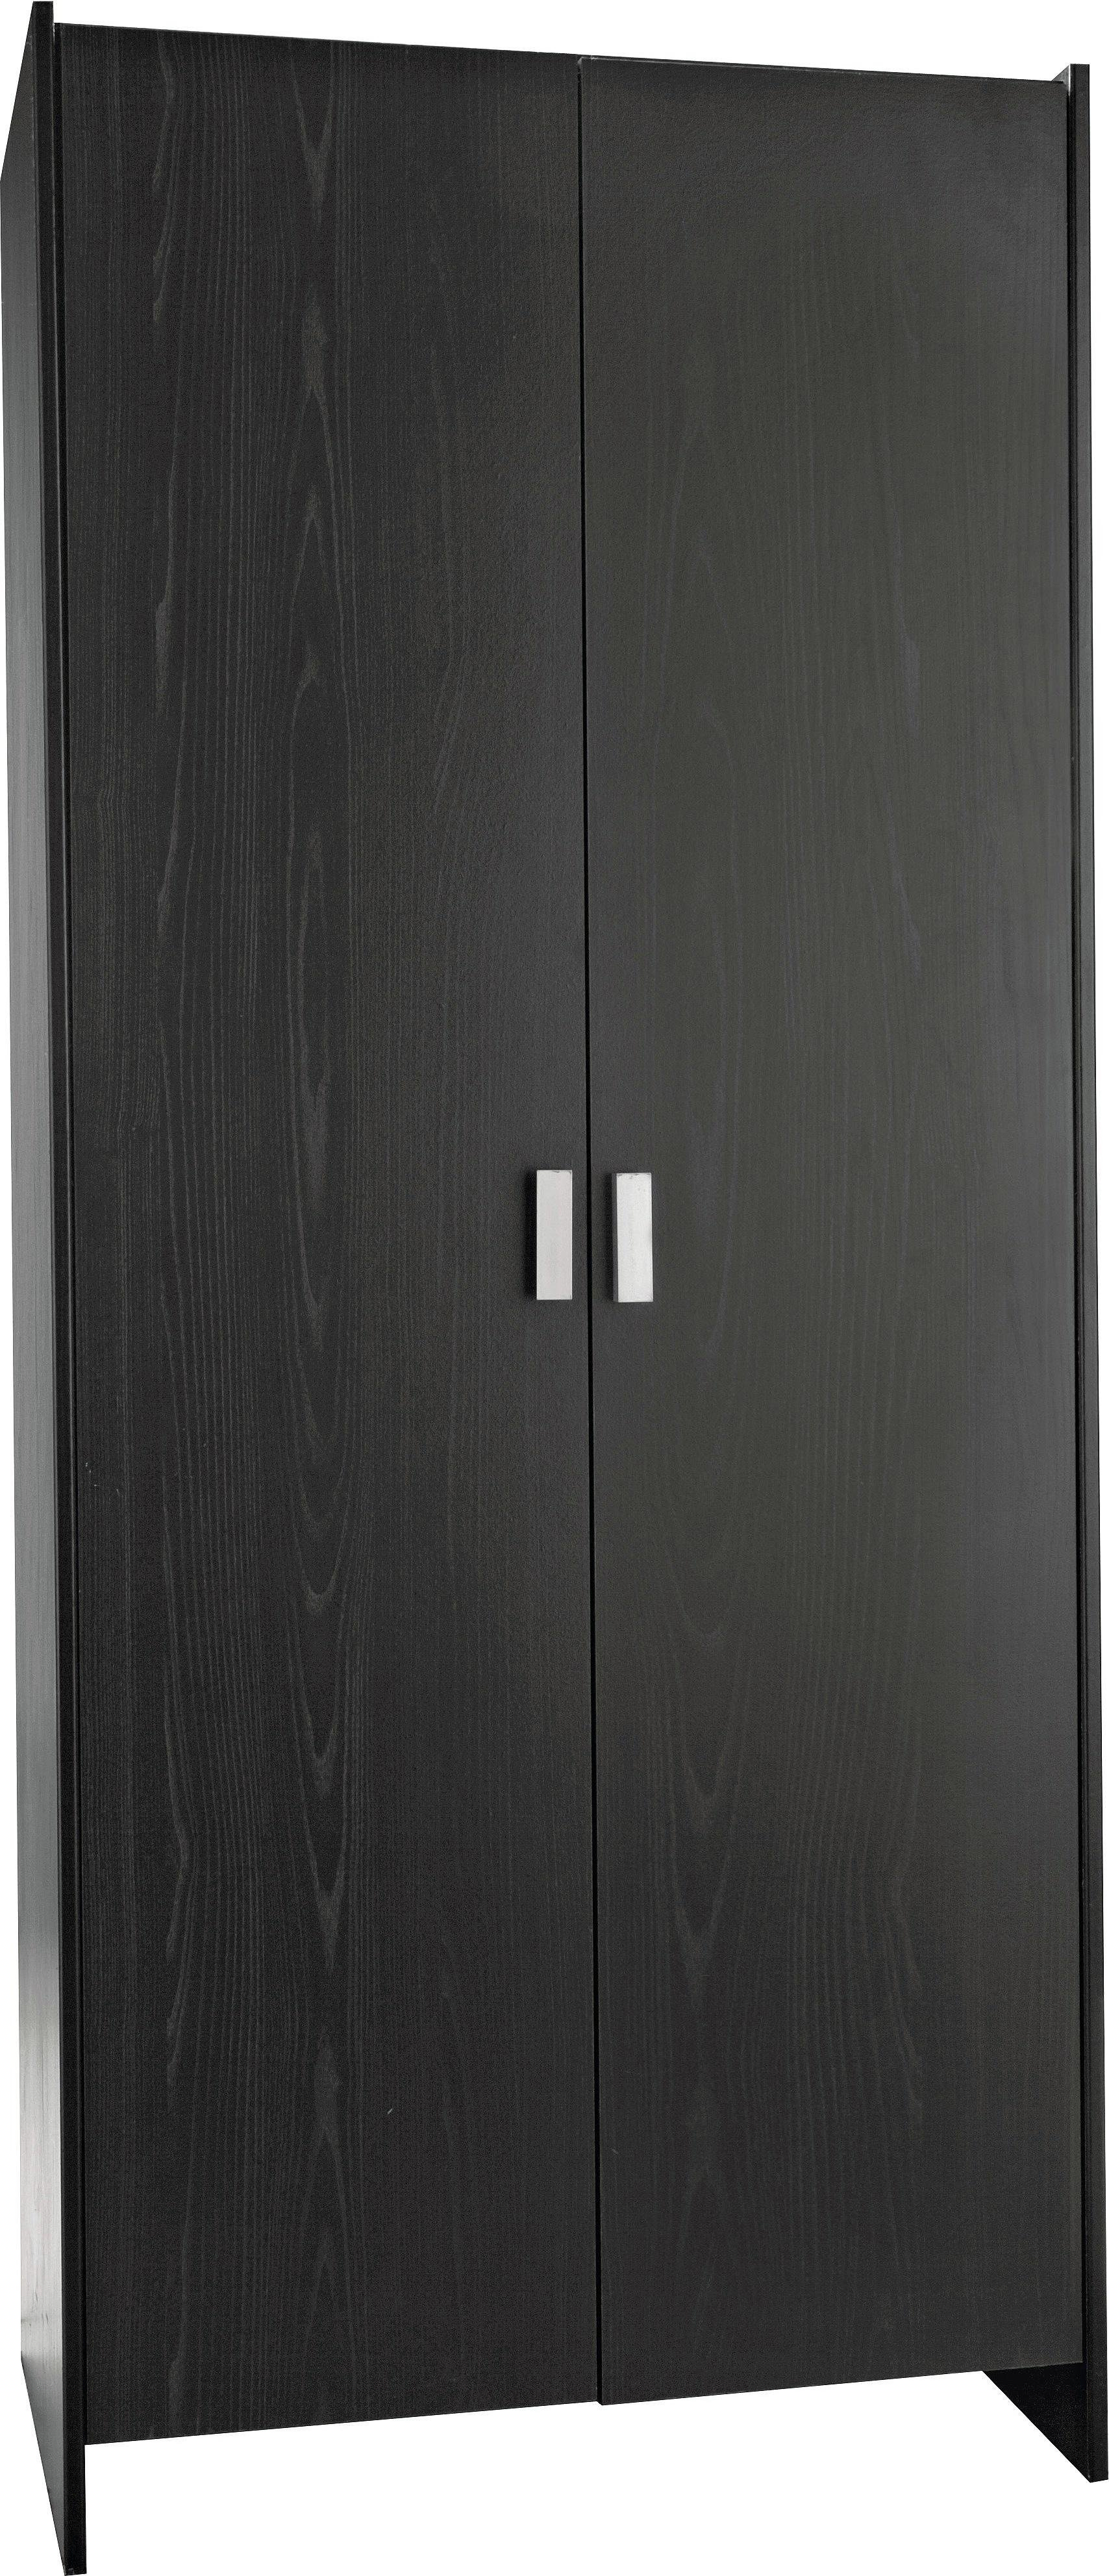 black wardrobe home new capella 2 door wardrobe - black498/9062 HQWMLIQ